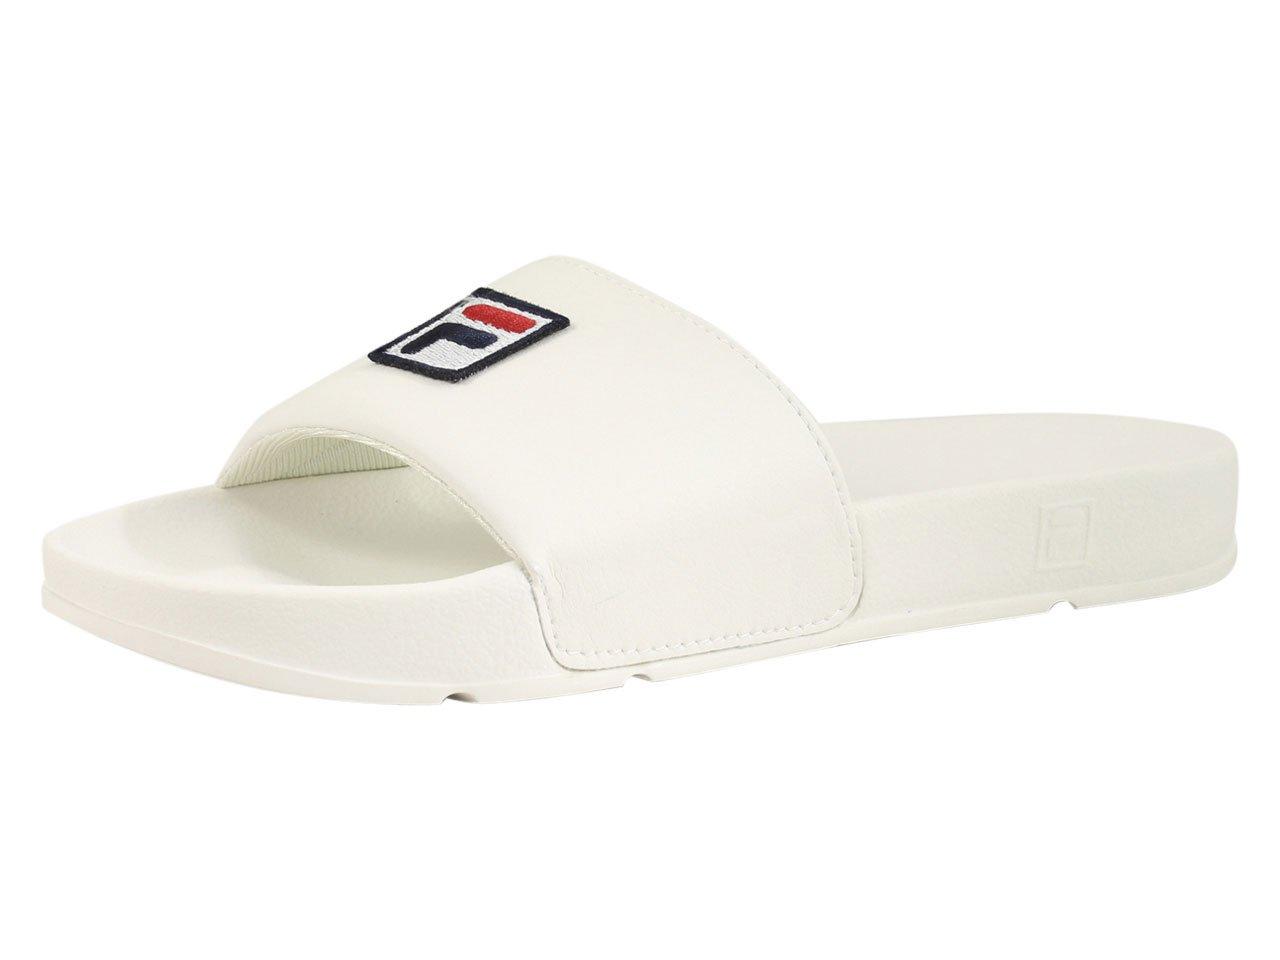 Fila Men's Drifter F-Box Sandals B07CP1YPMT 7 D(M) US|Gardenia, Fila Navy, Fila Red